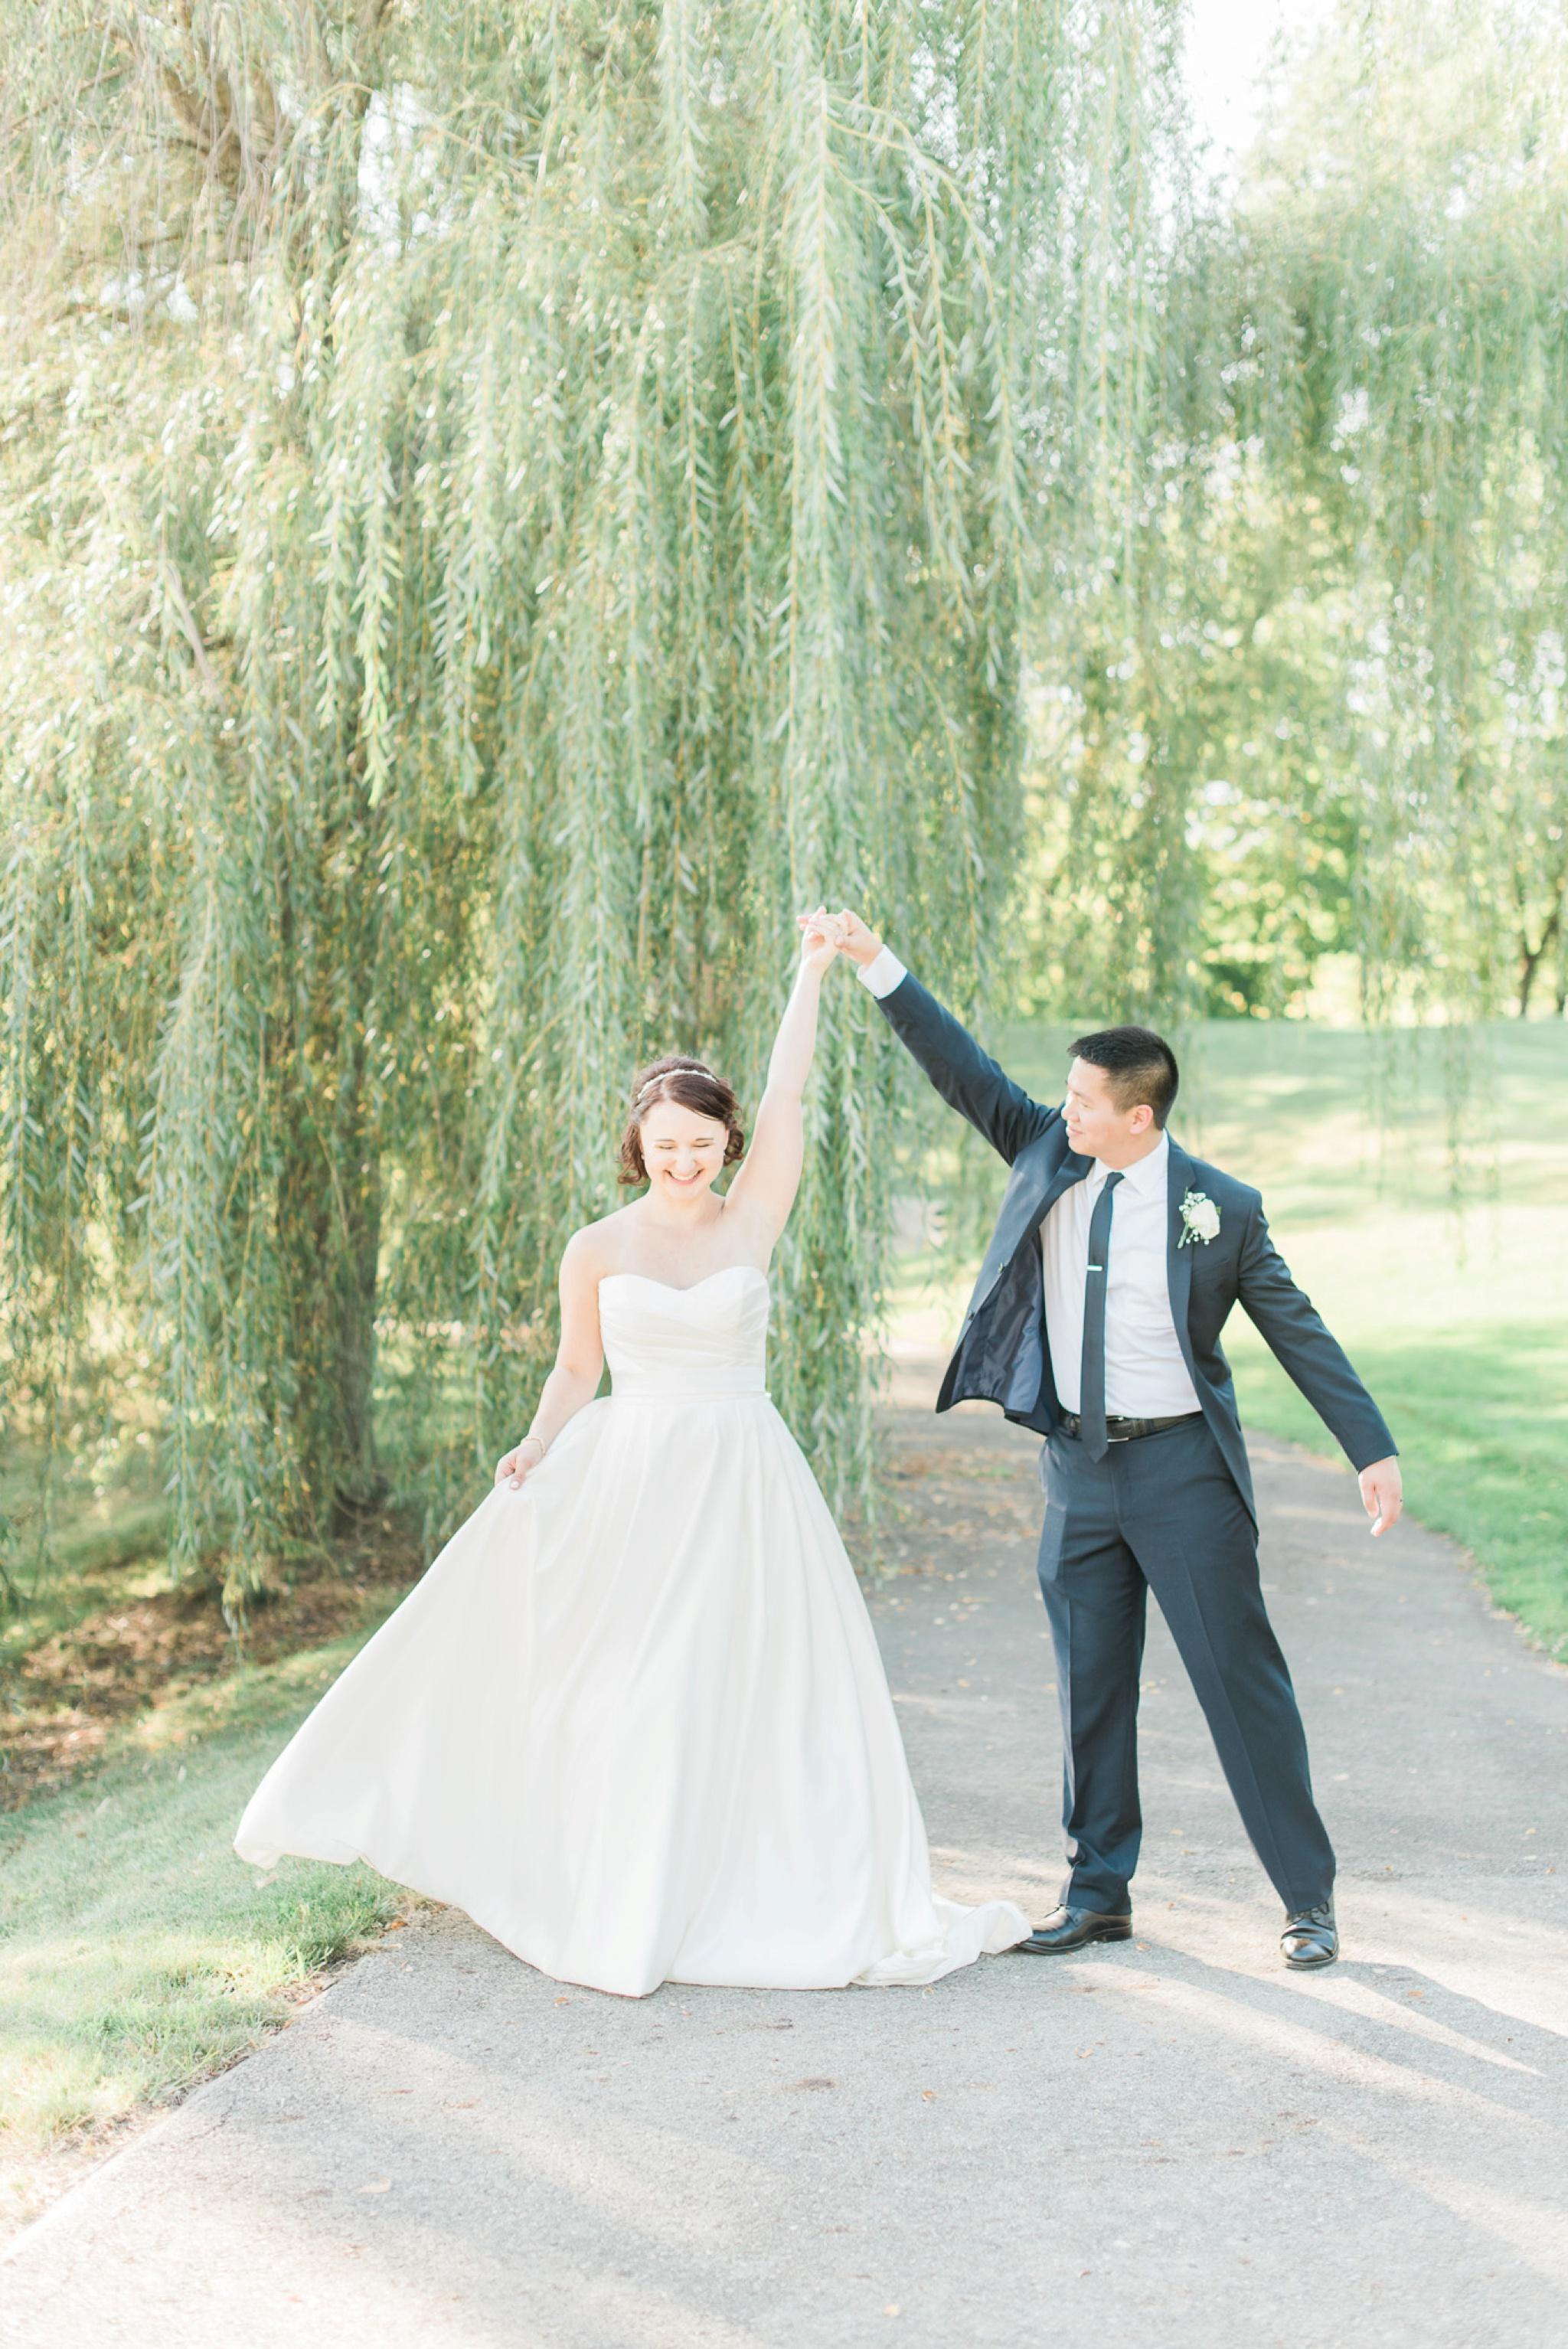 brookside-golf-country-club-wedding-columbus-ohio-106.jpg